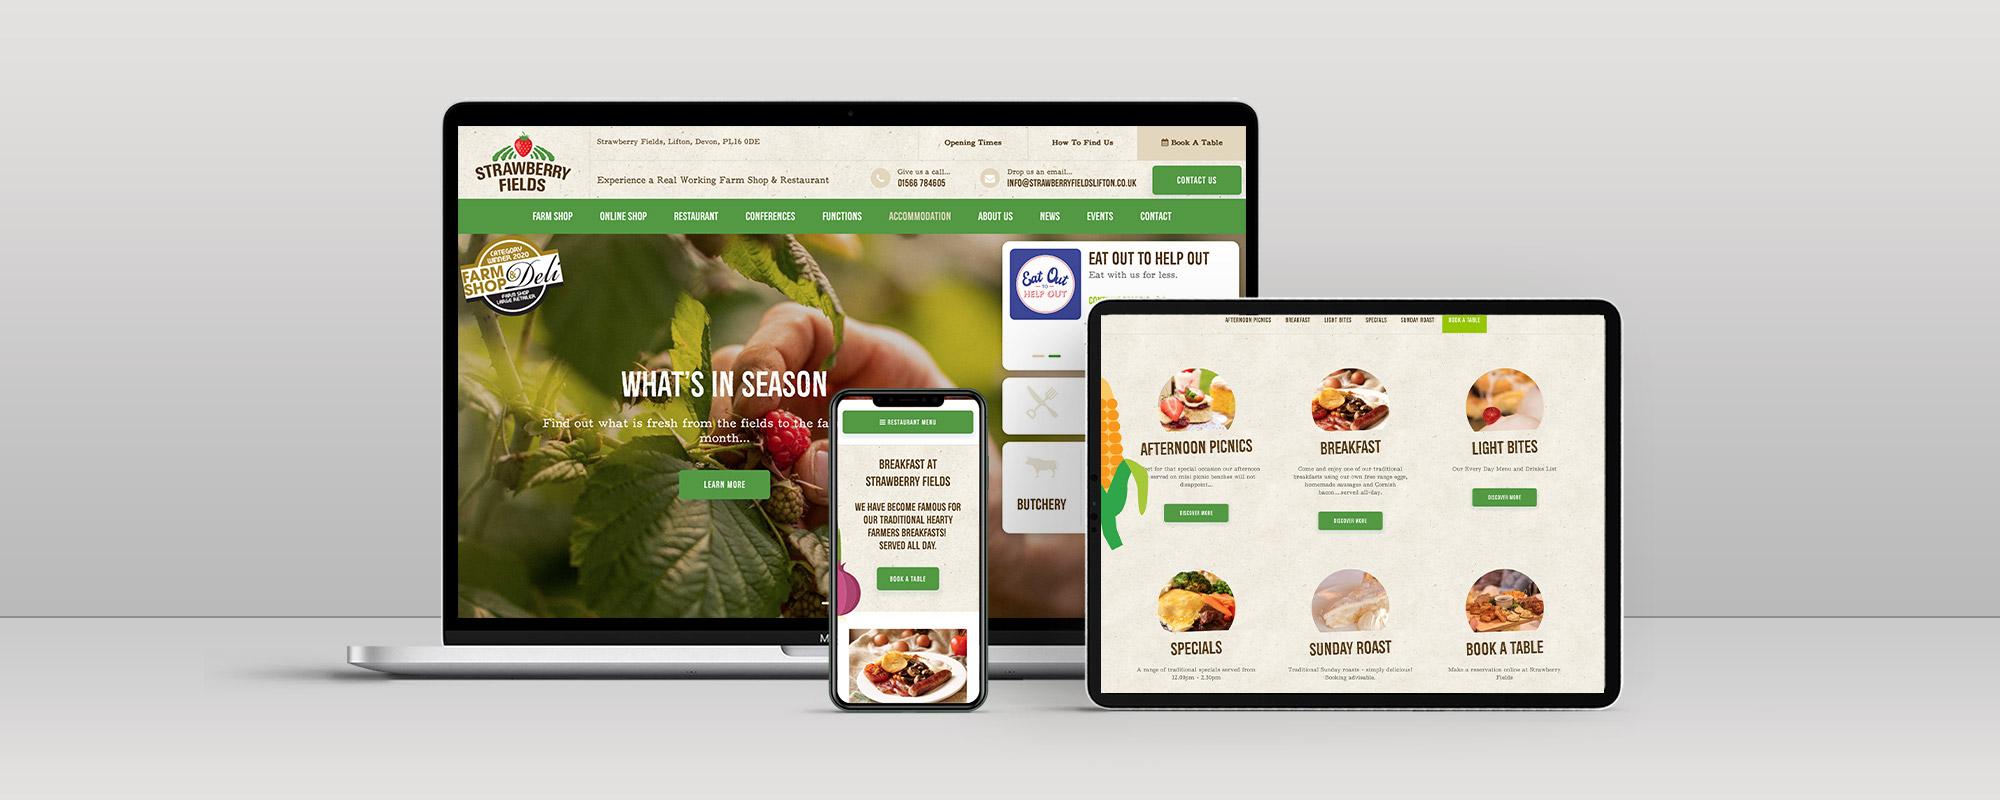 Strawberry Fields Wordpress Website Design on 3 Devices